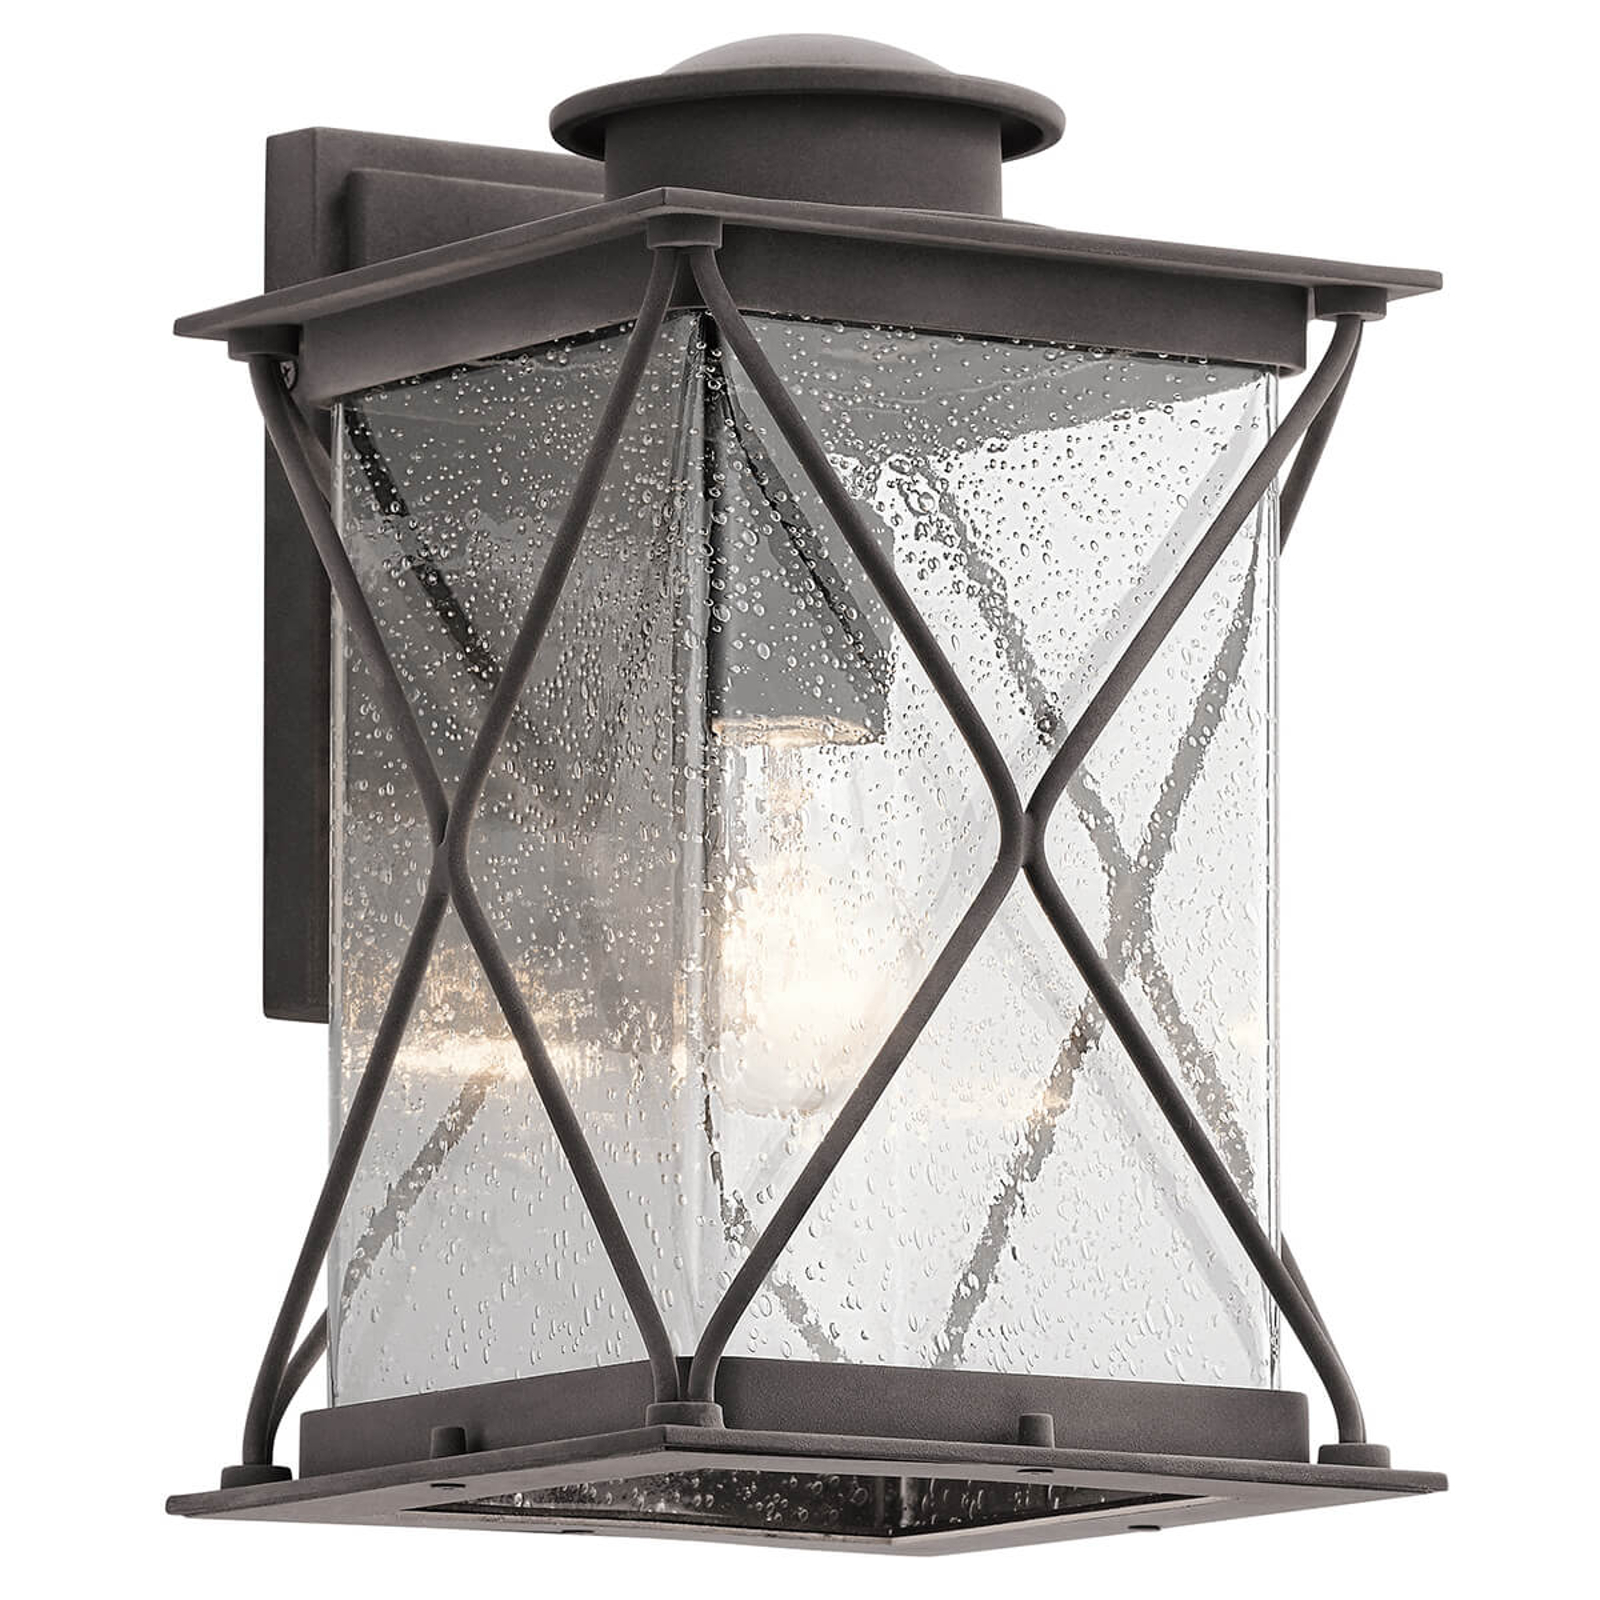 Grote buitenwandlamp Argyle